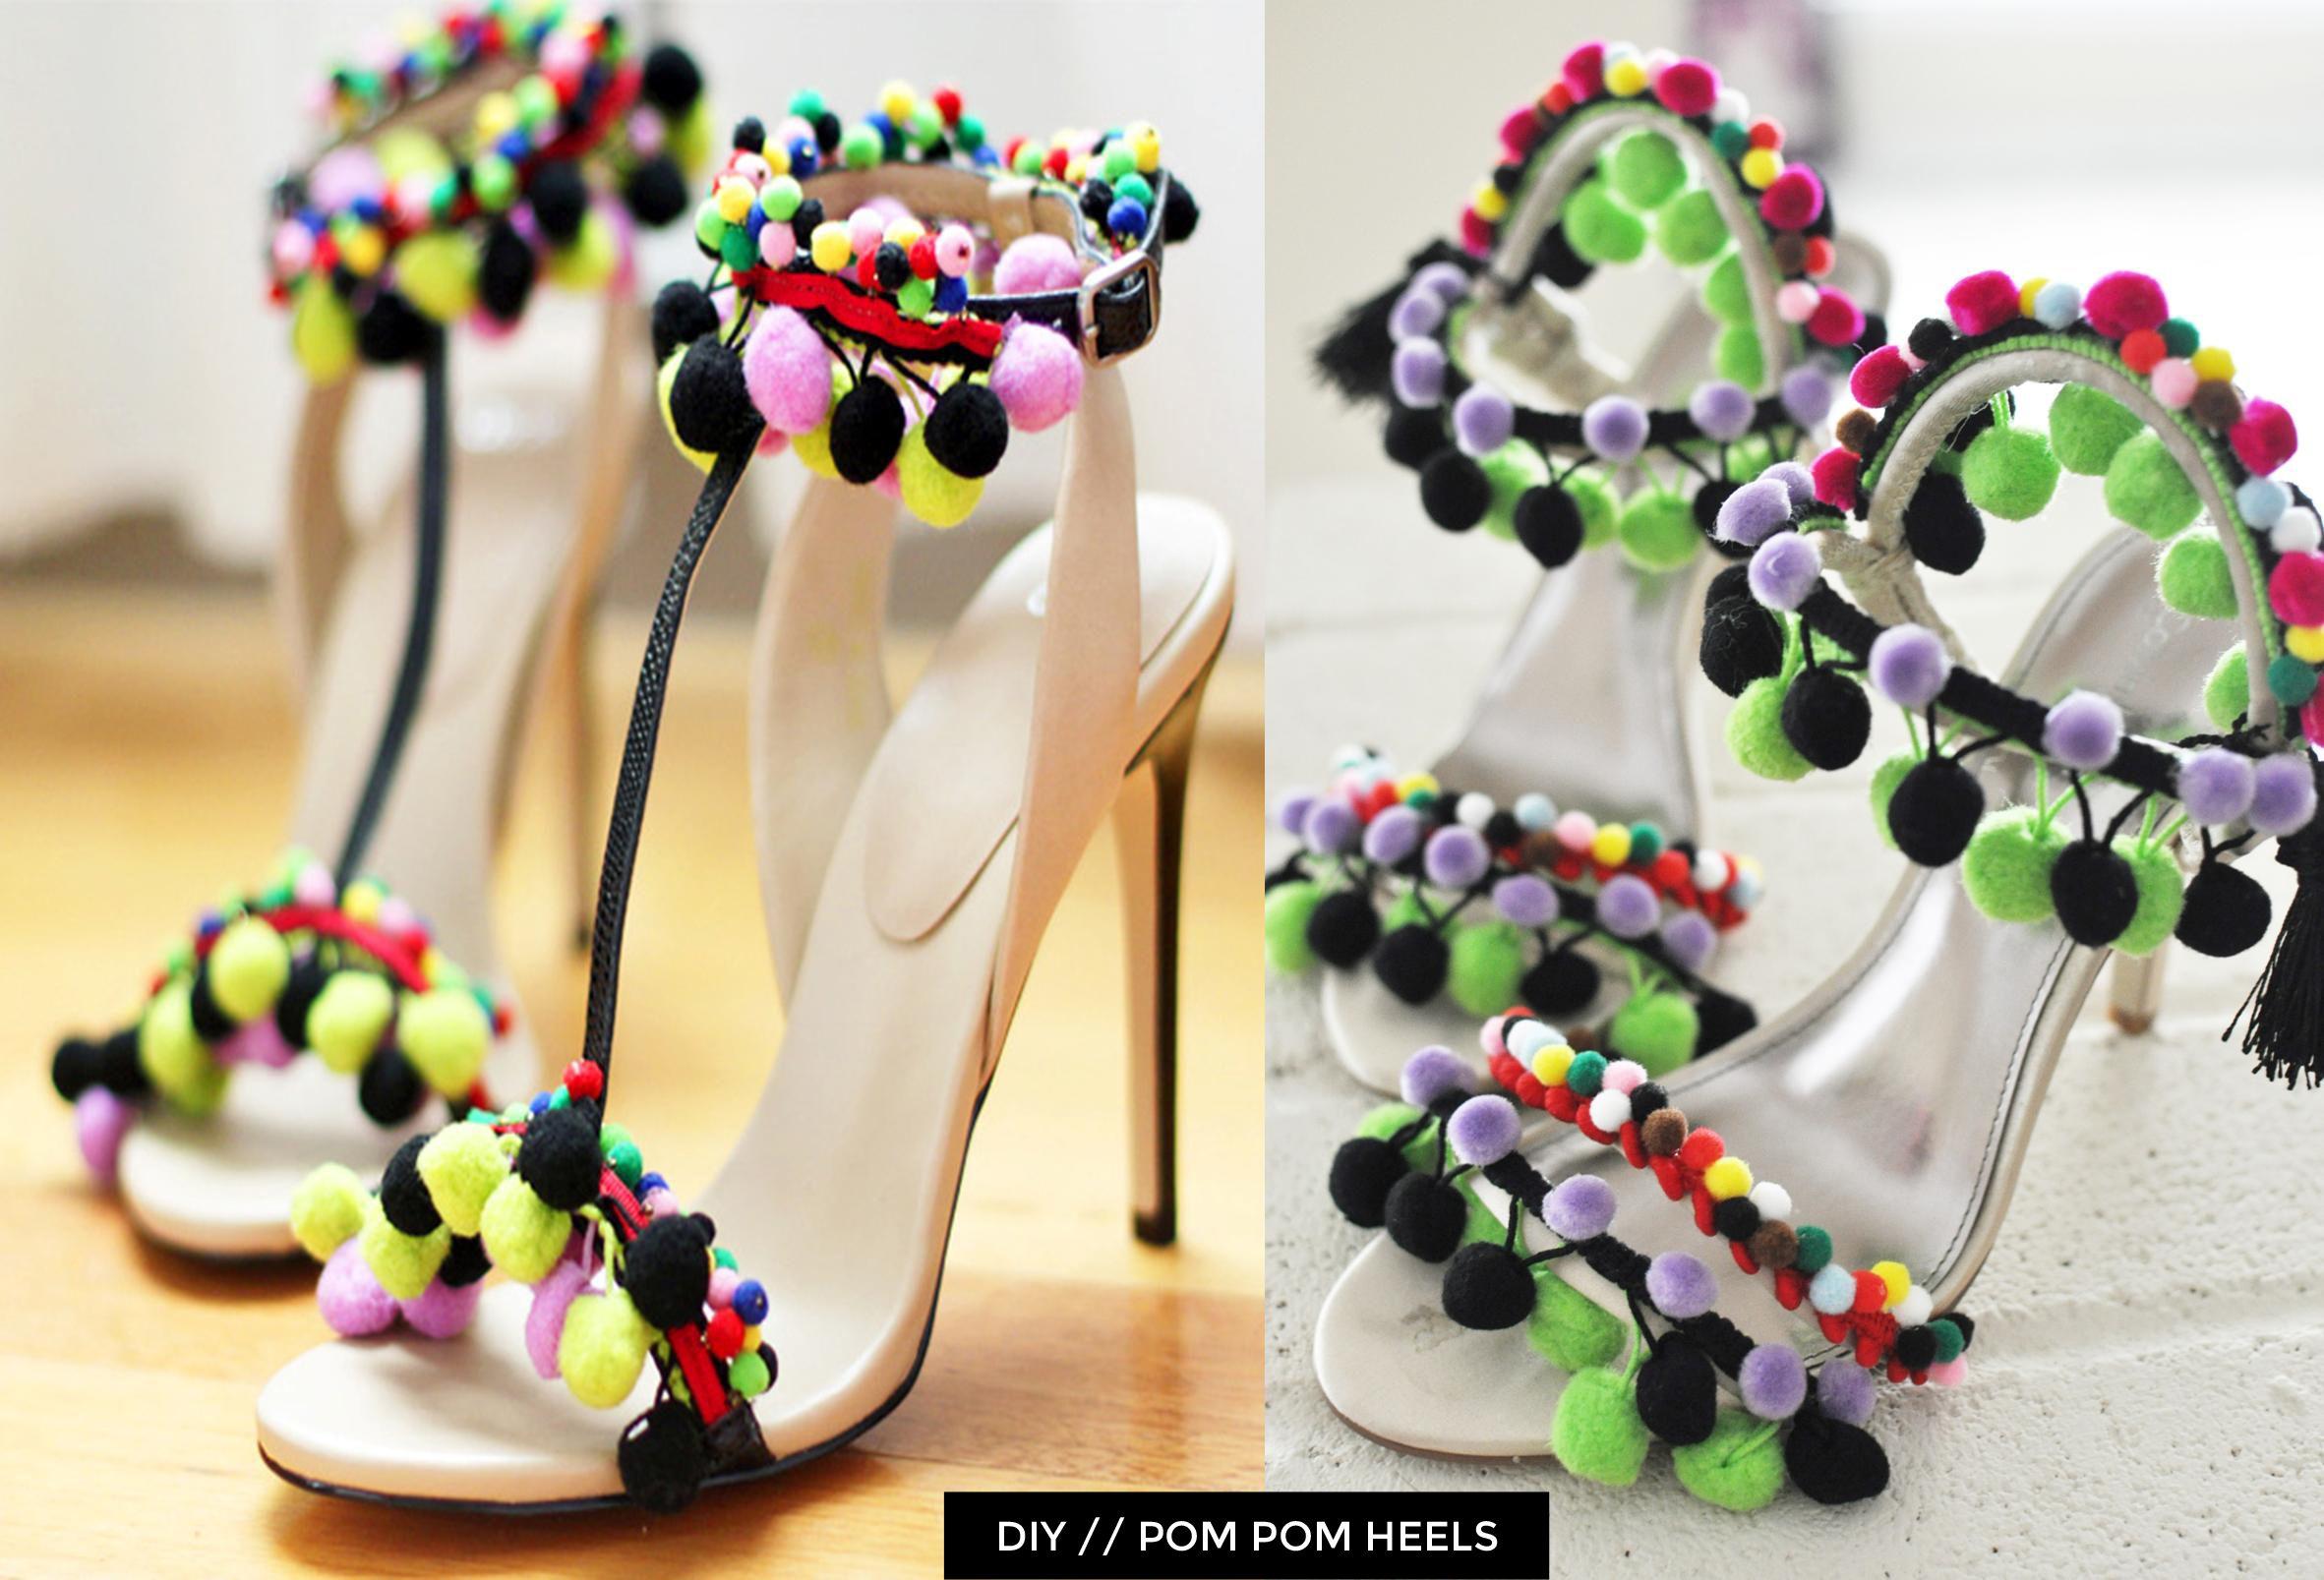 7ff9a781d5 ASOS vs DIY_Pom Pom Heels_Images_w text | Fashionista... | Summer ...